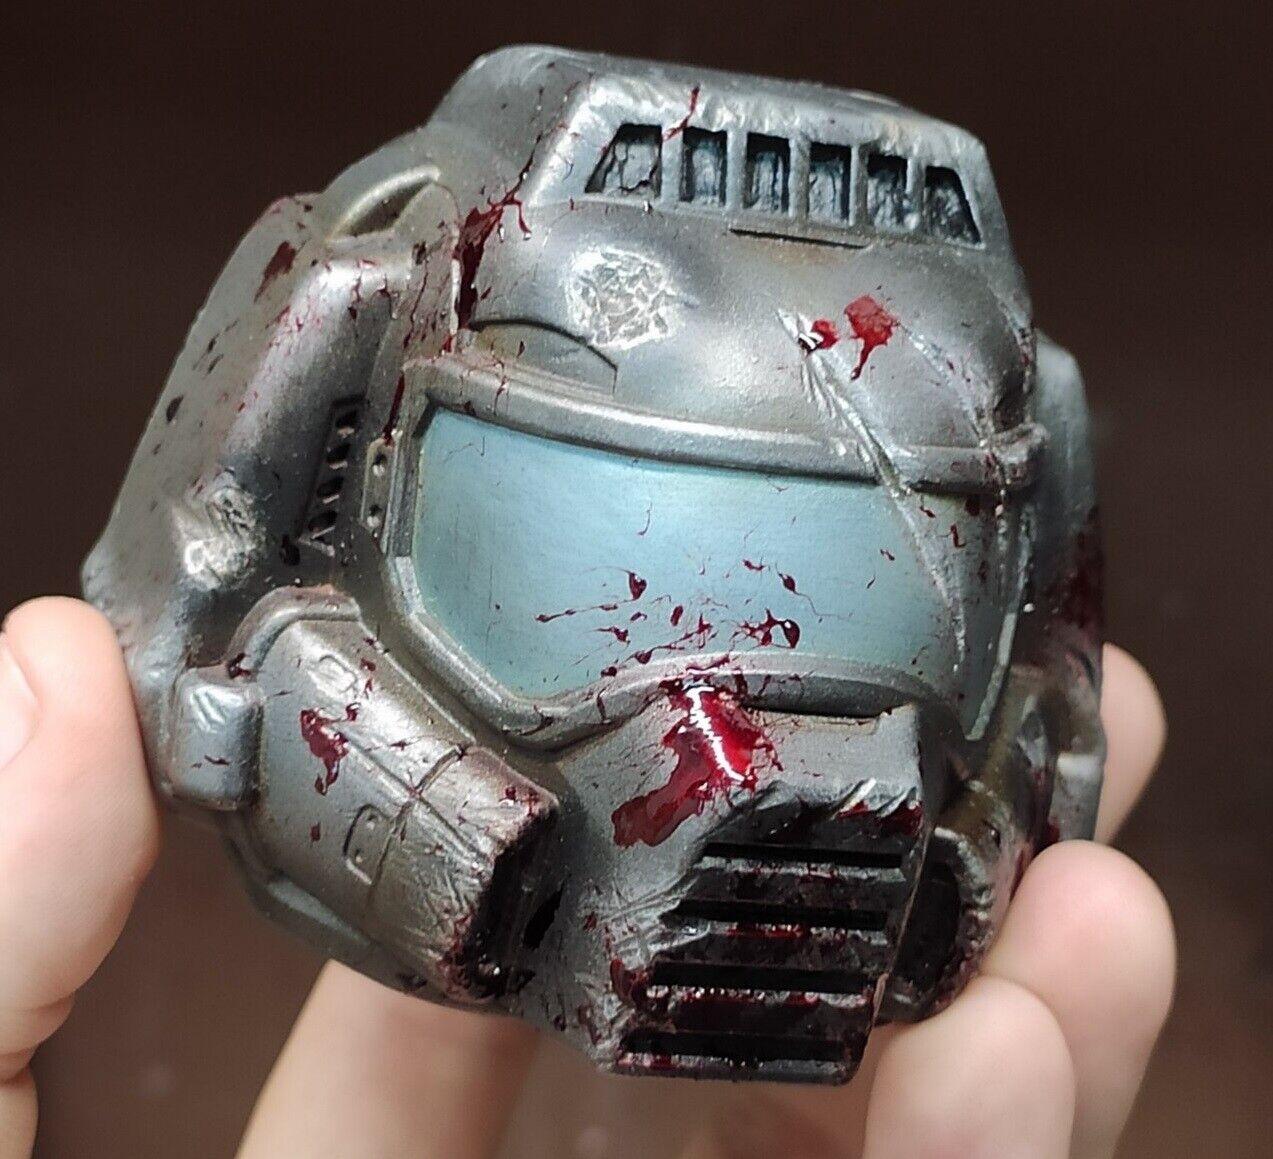 Doom classeic  Doomguy slayer helmet bloody version gioco giocor gift ps4 props